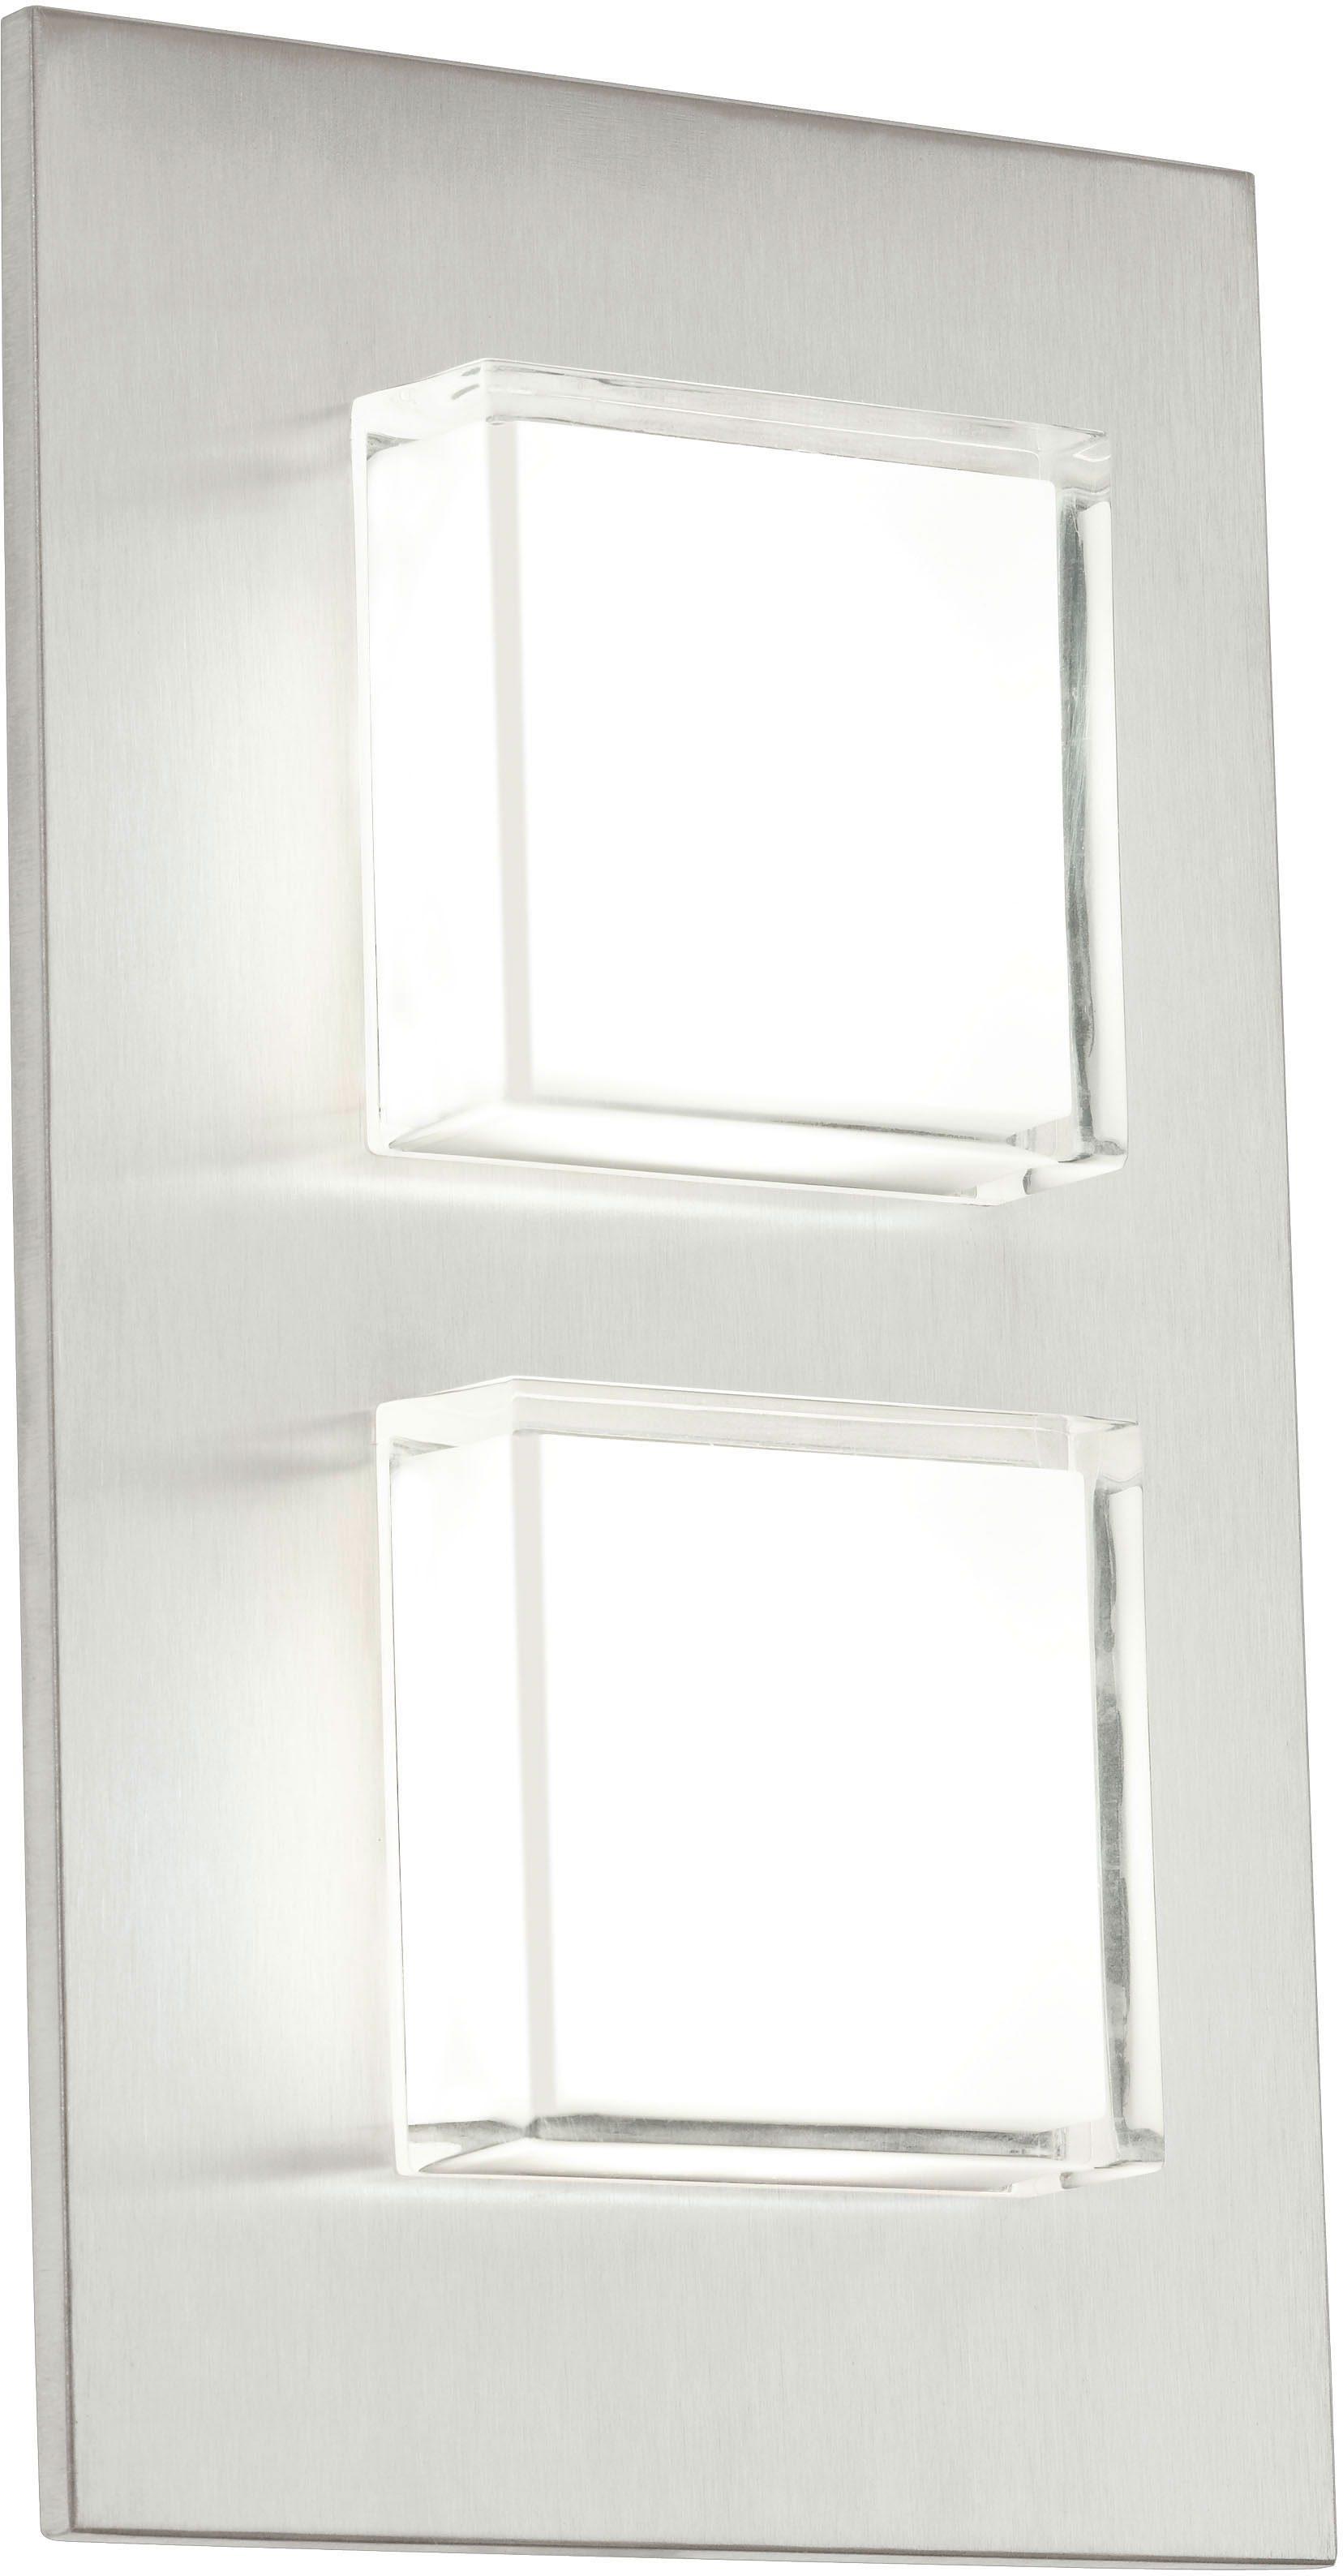 Eglo LED Außenleuchte, 2 flg., Wandleuchte, »Pias«